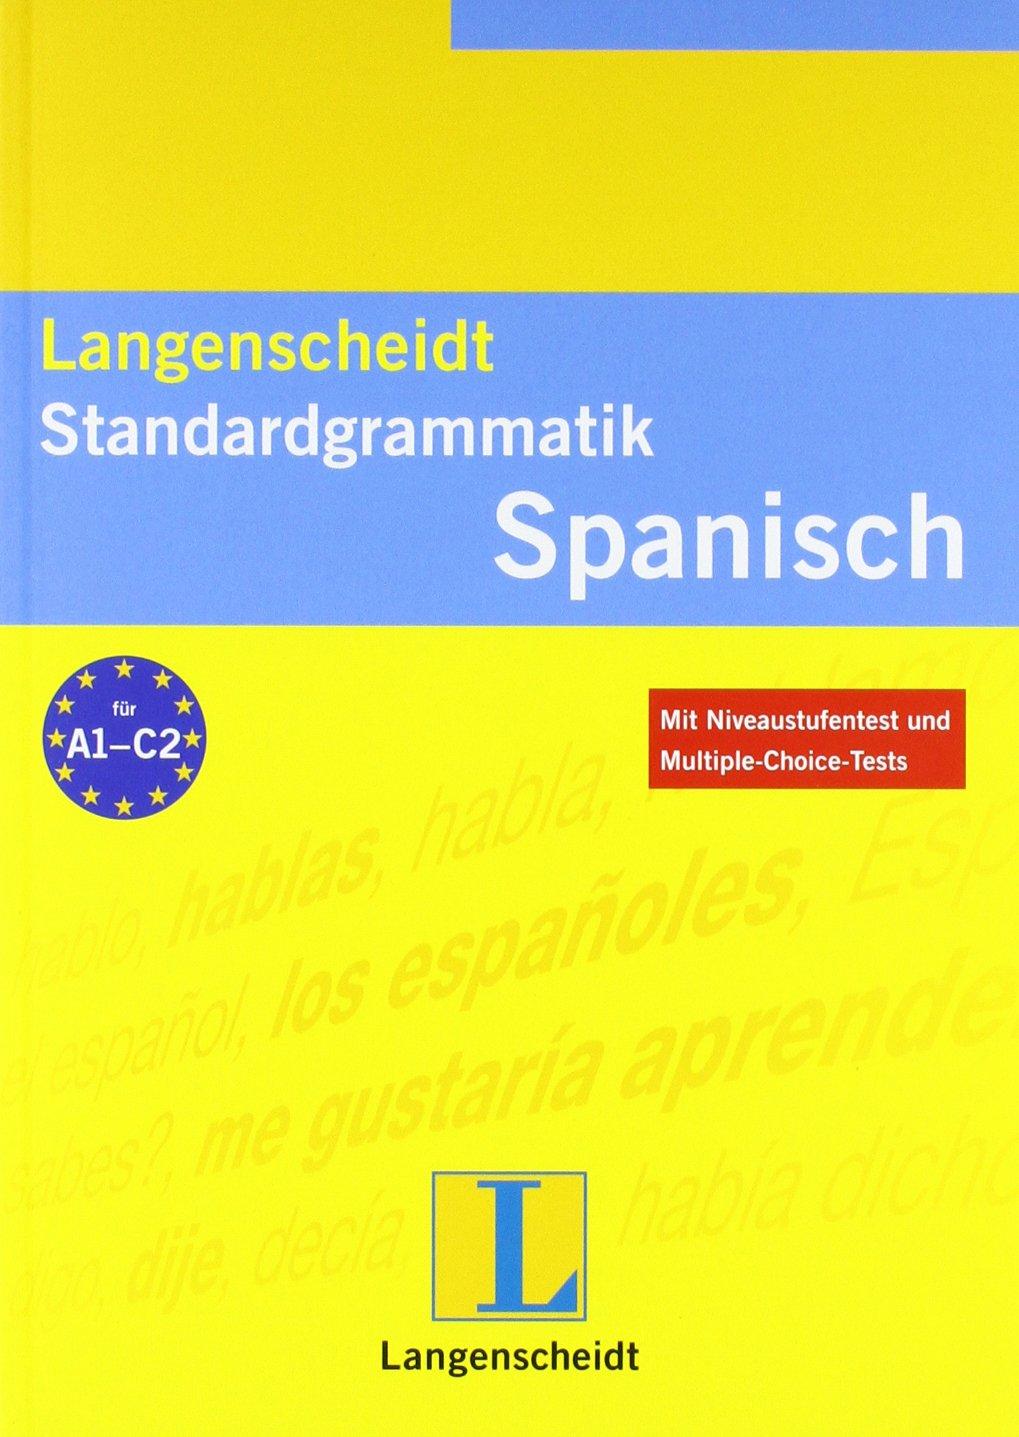 Langenscheidt Standardgrammatik Spanisch (Langenscheidt Standardgrammatiken)